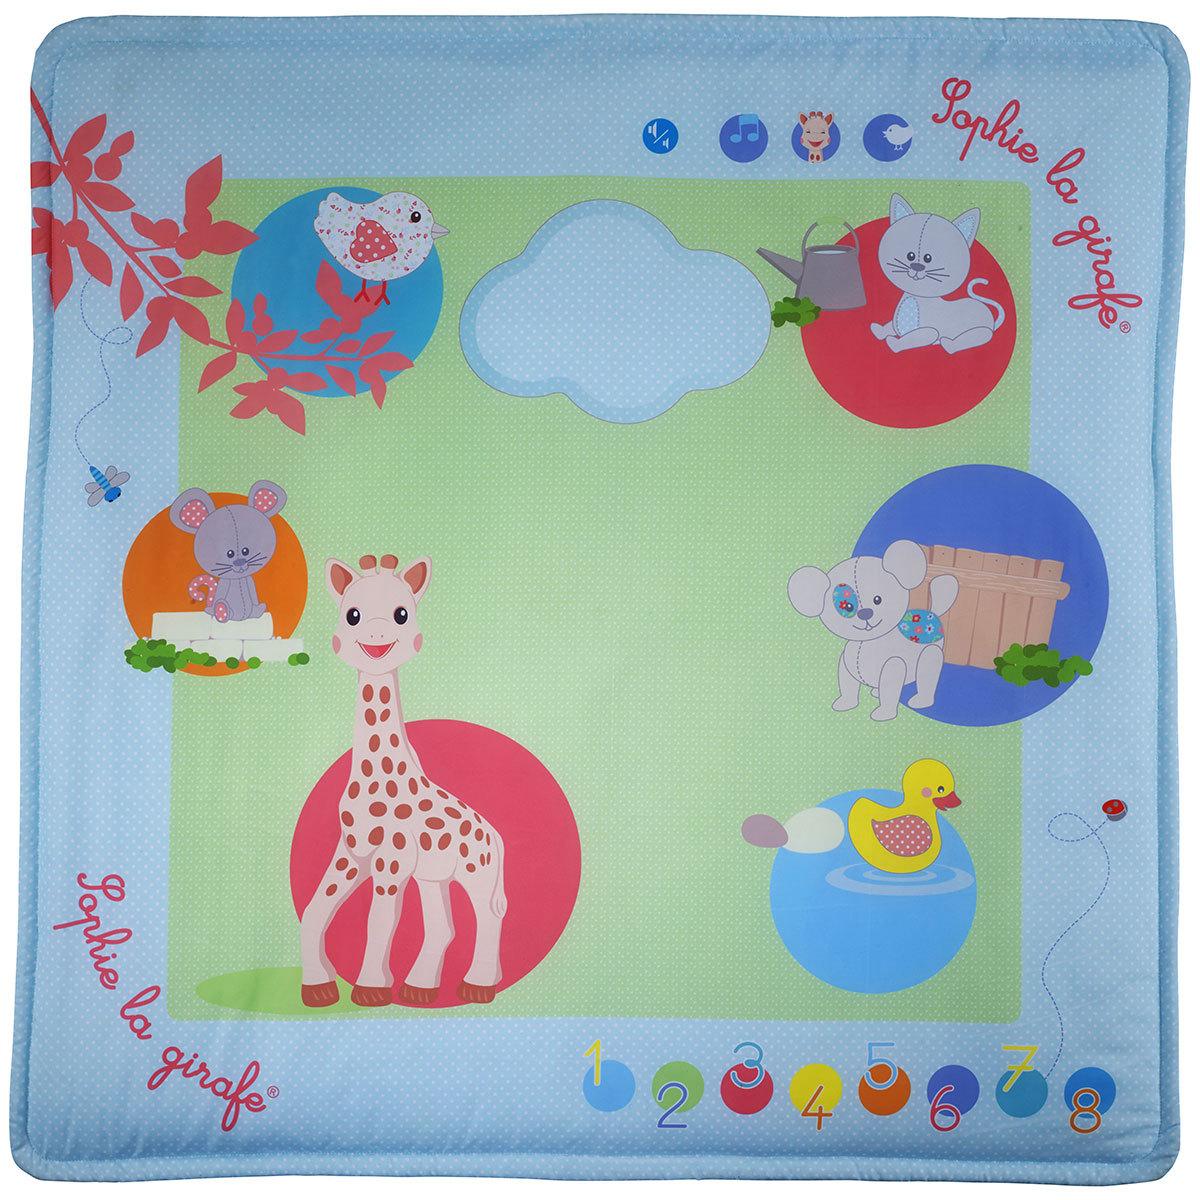 tapis d 39 eveil touch play mat sophie la girafe 240114. Black Bedroom Furniture Sets. Home Design Ideas